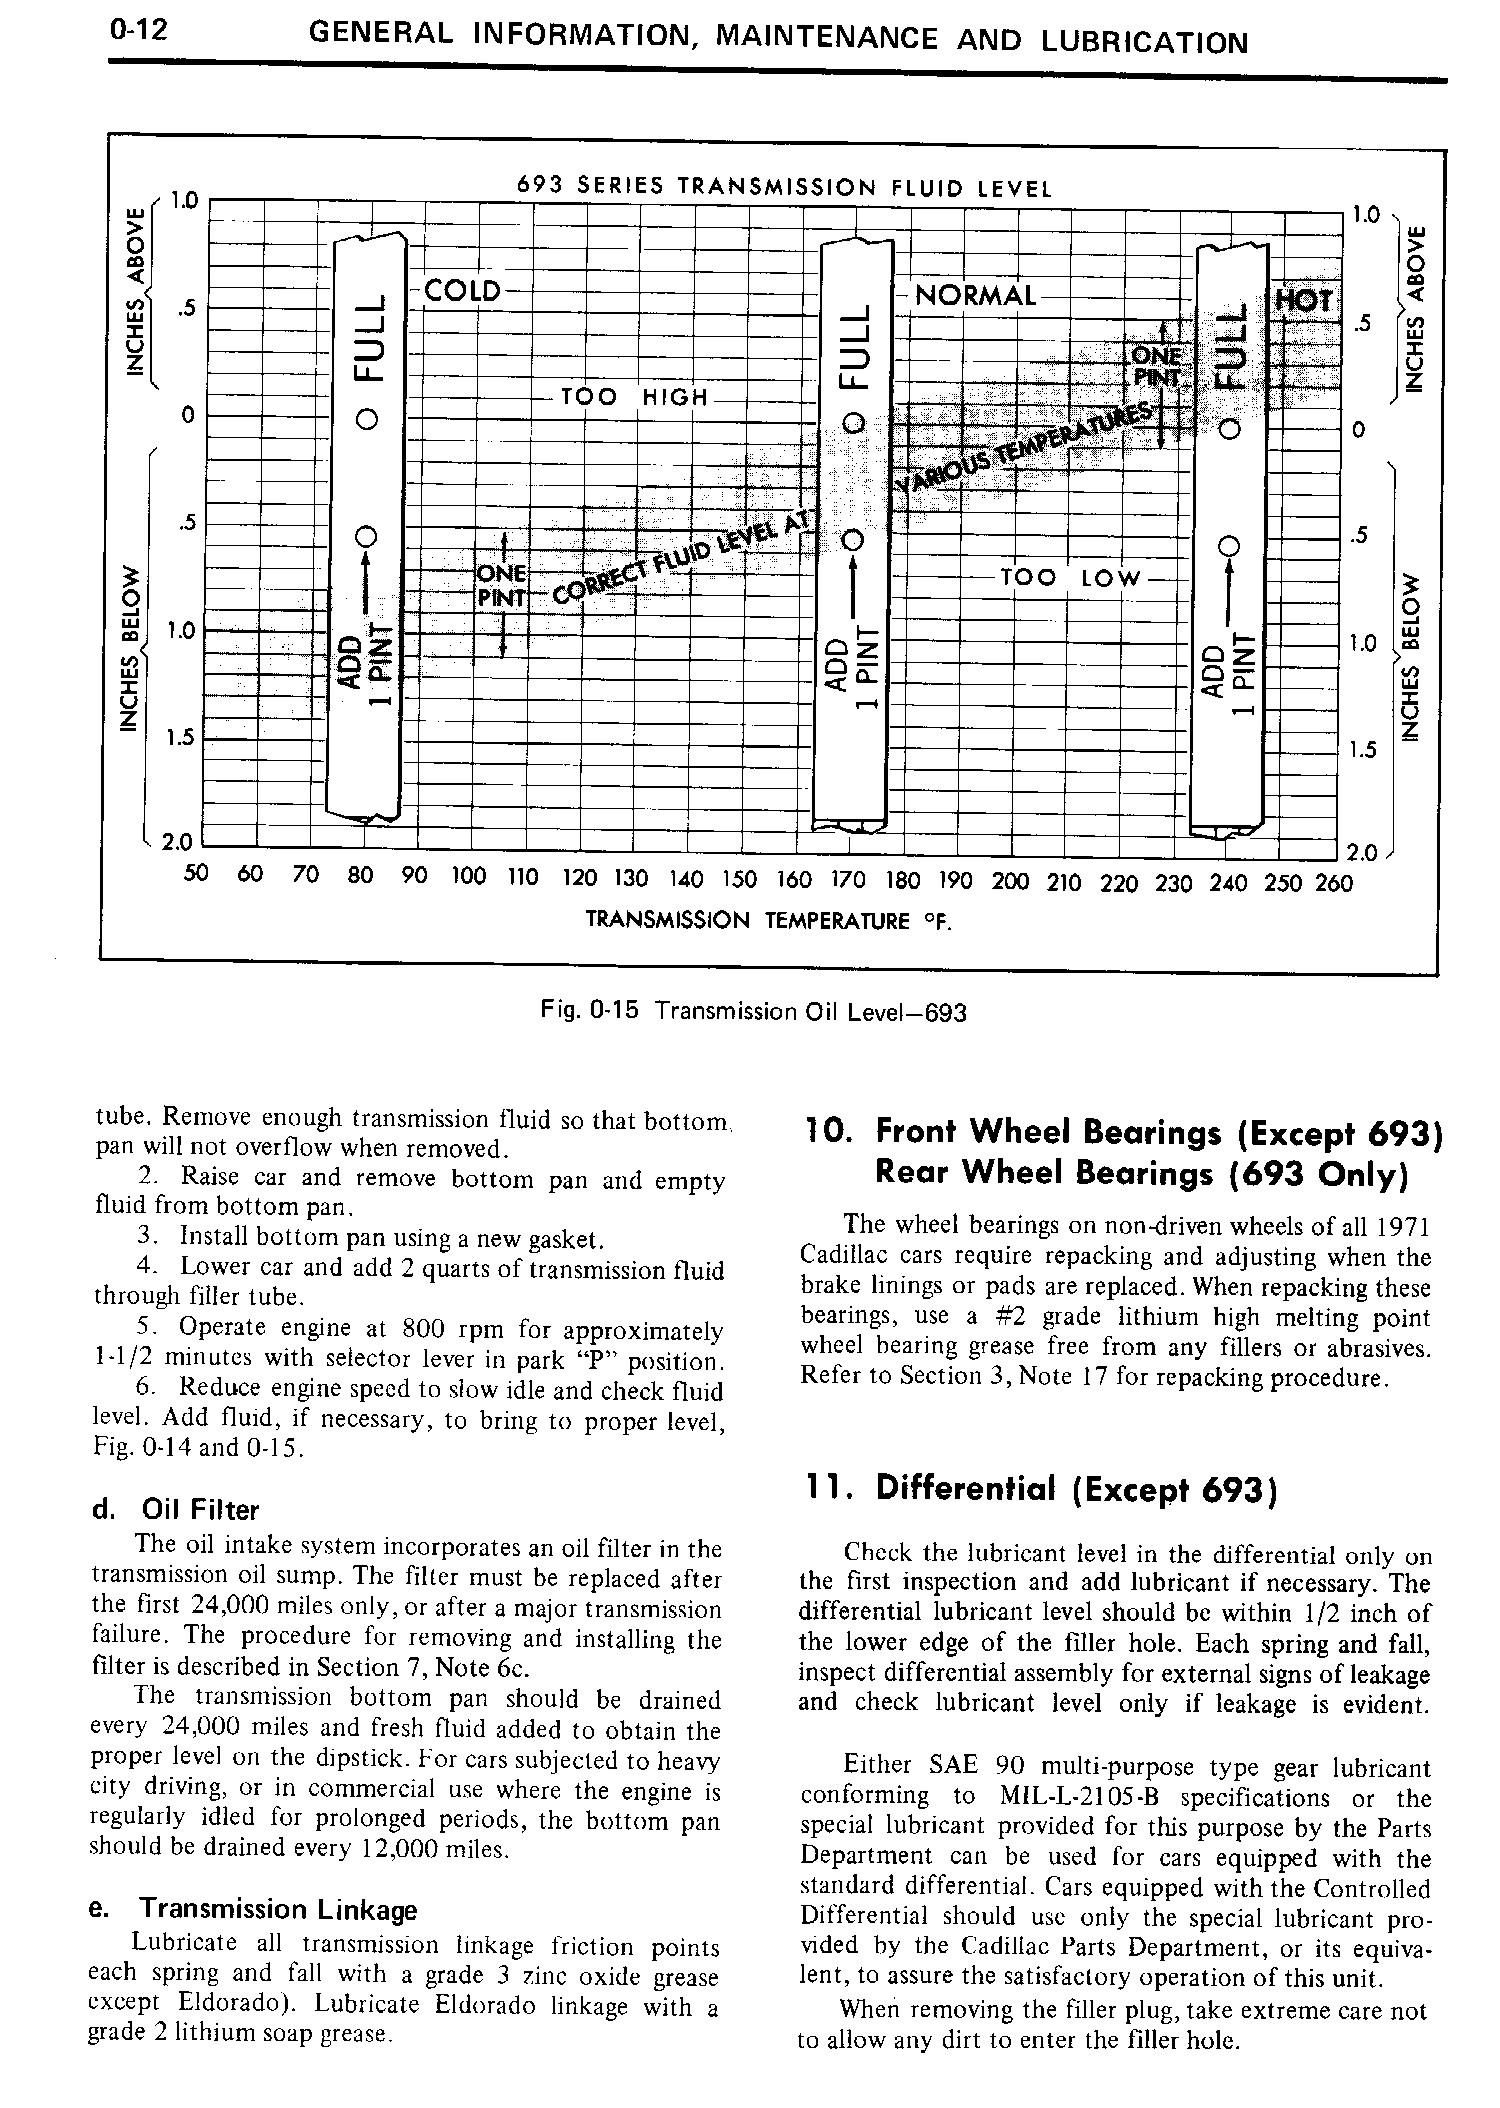 1971 Cadillac Shop Manual- General Information Page 13 of 22